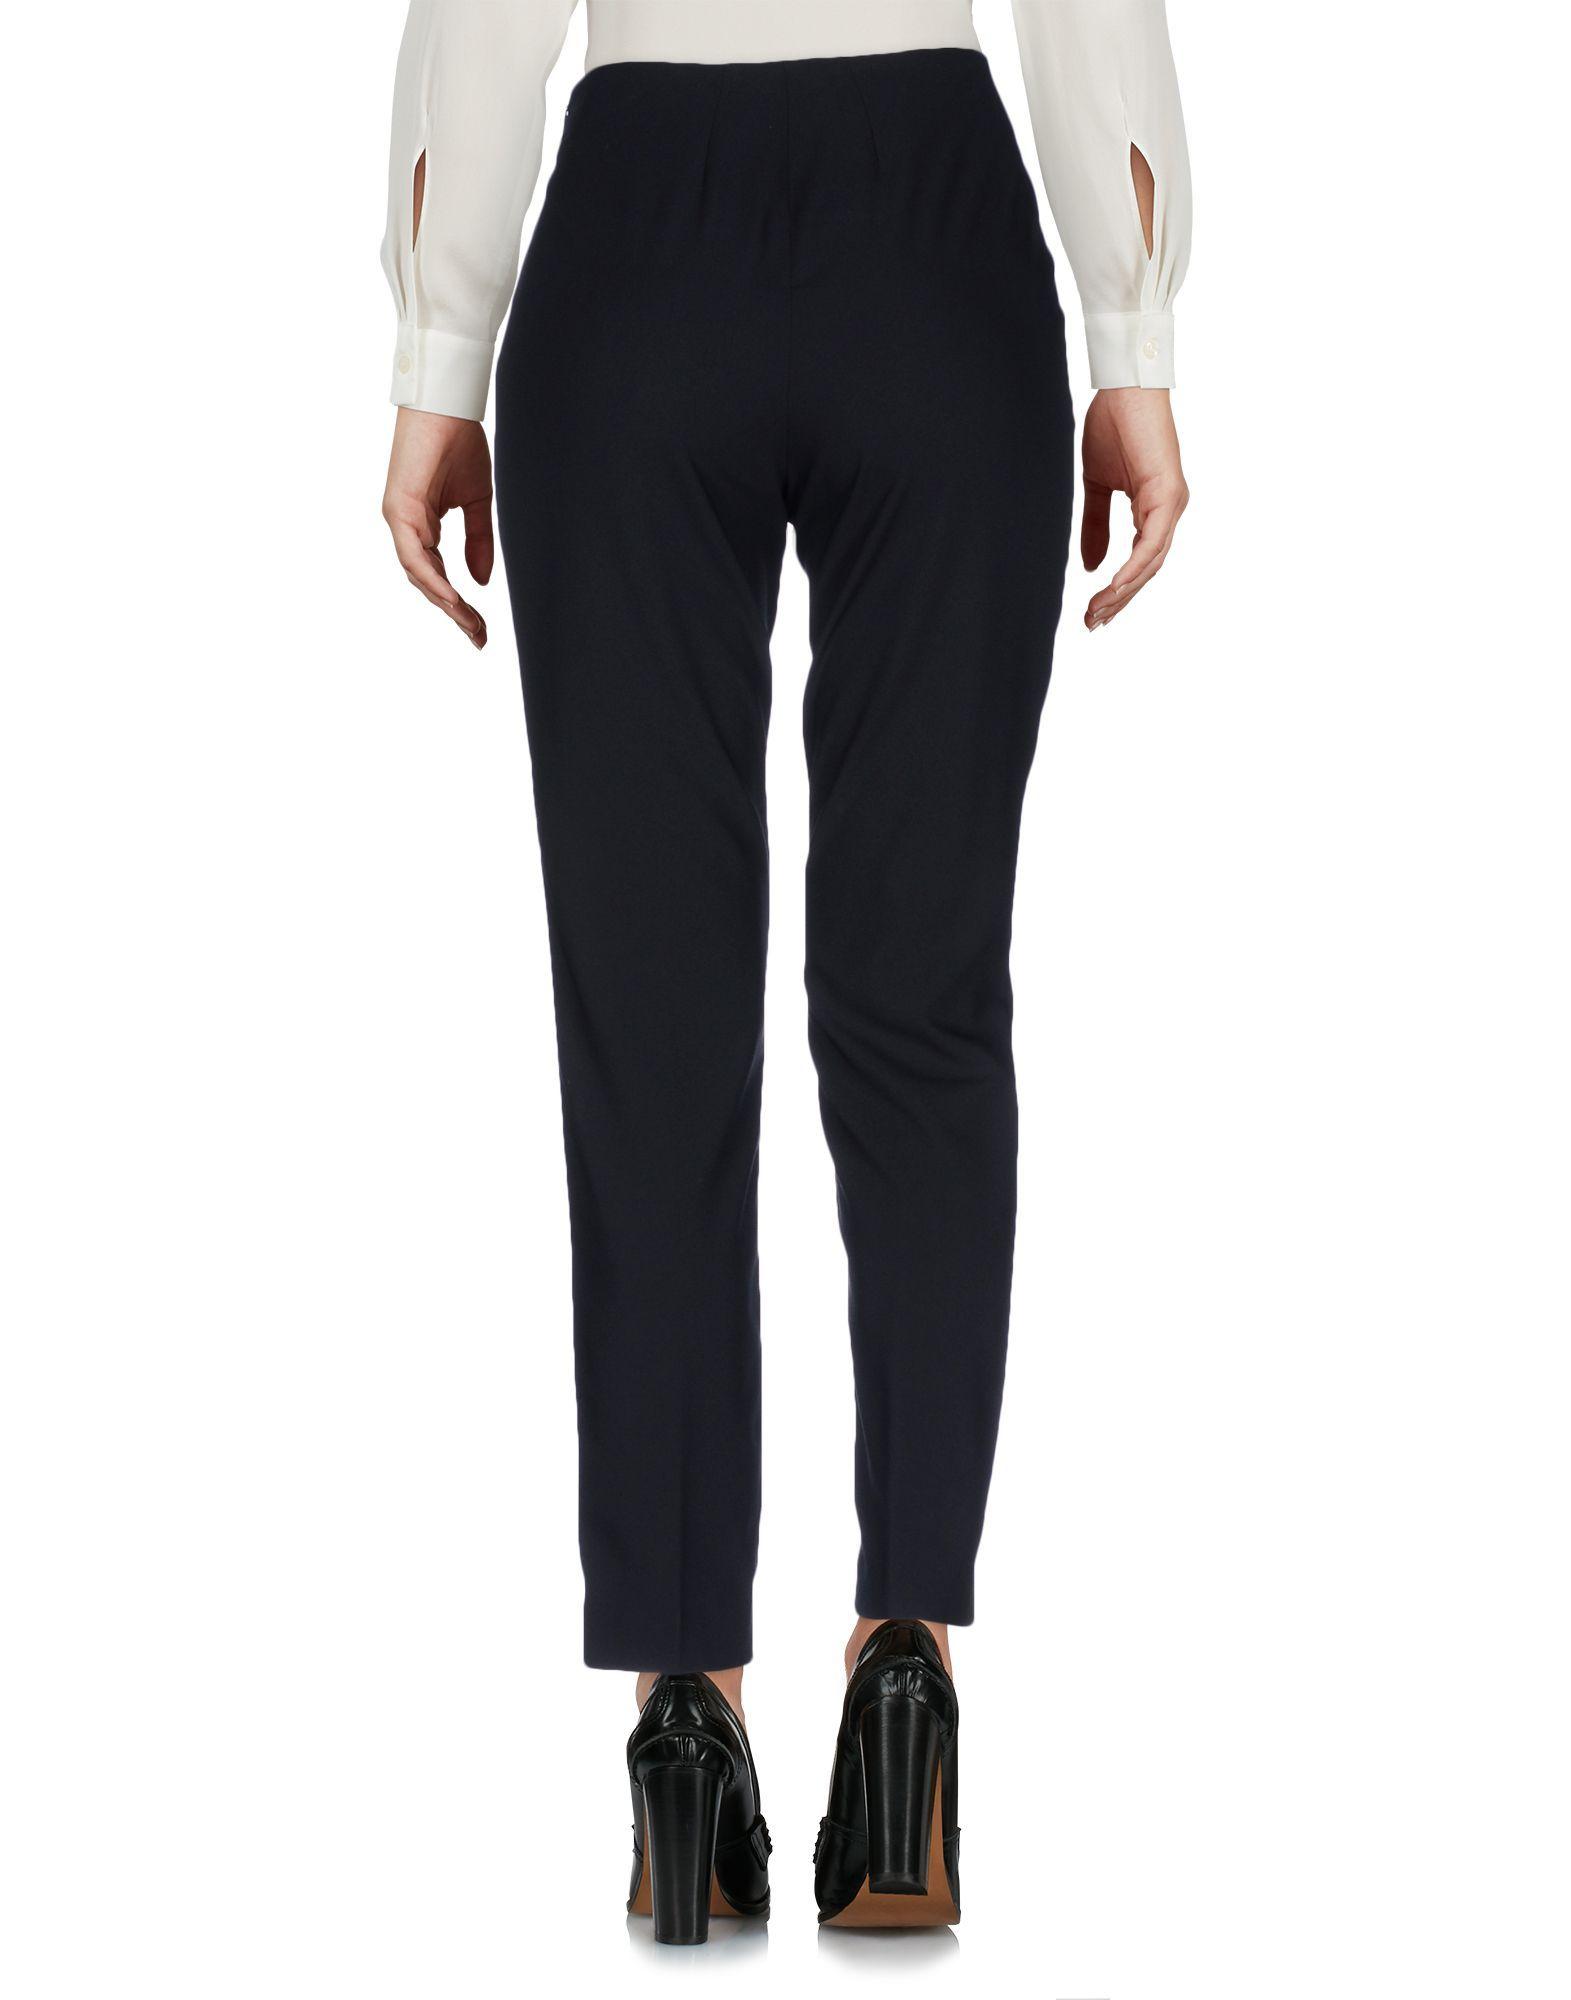 Philosophy Di Lorenzo Serafini Black Virgin Wool Tailored Trousers